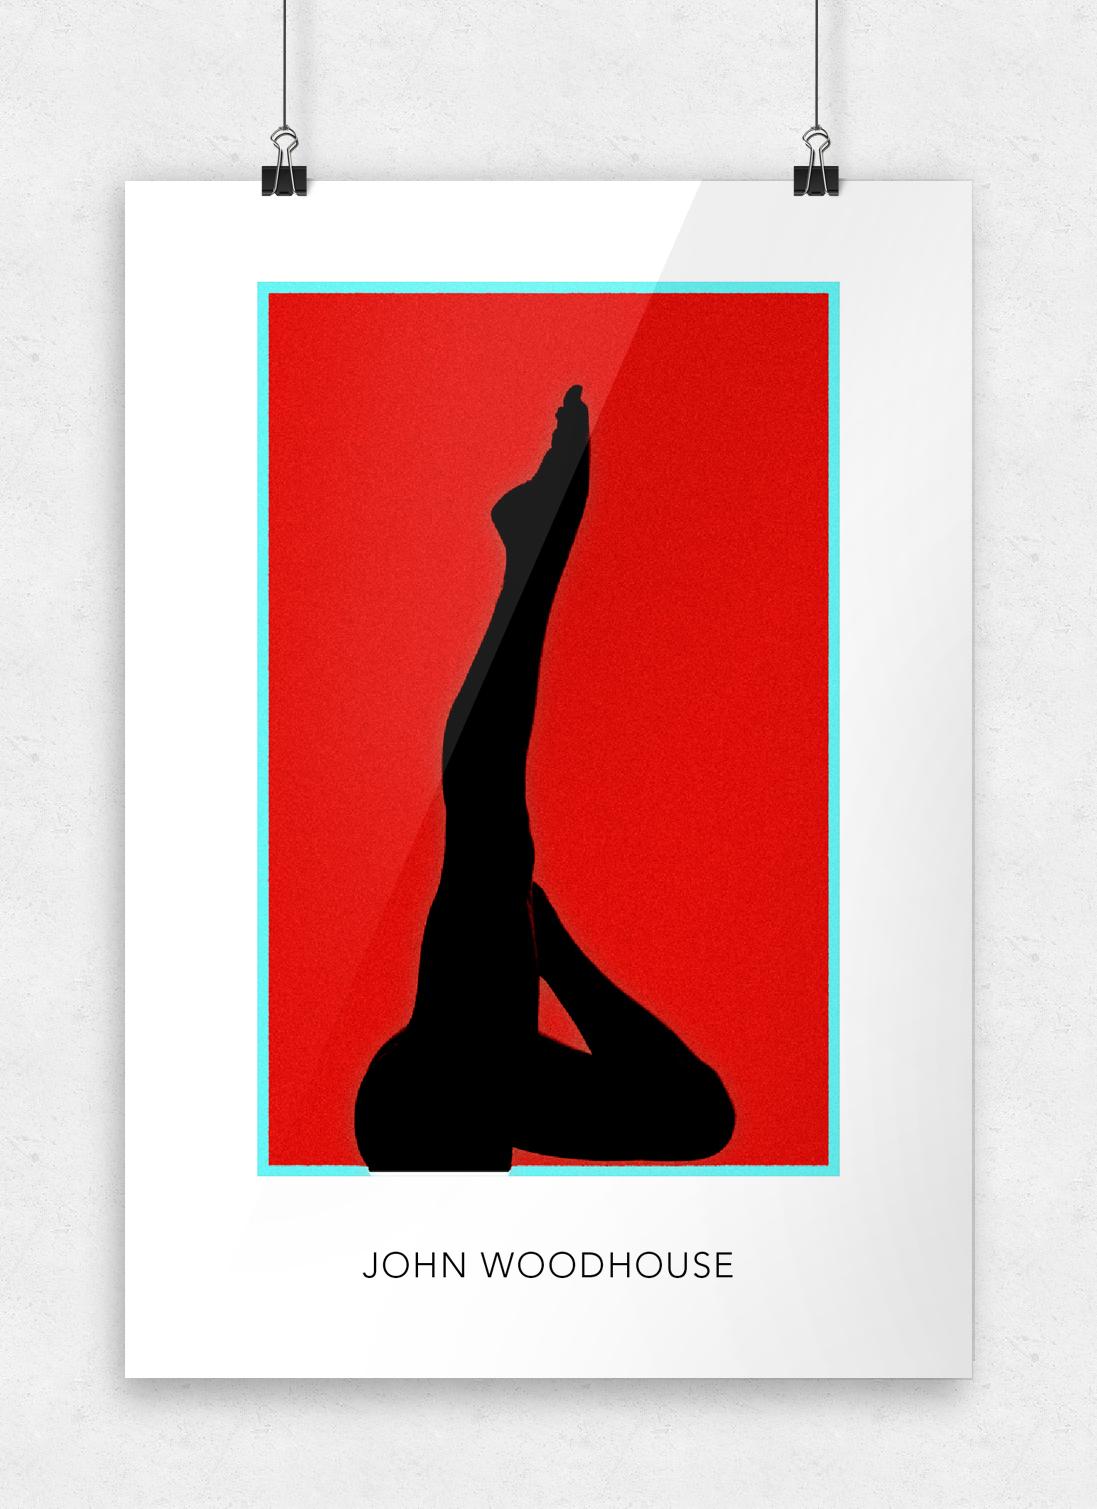 JW-Posters-Template_15.jpg